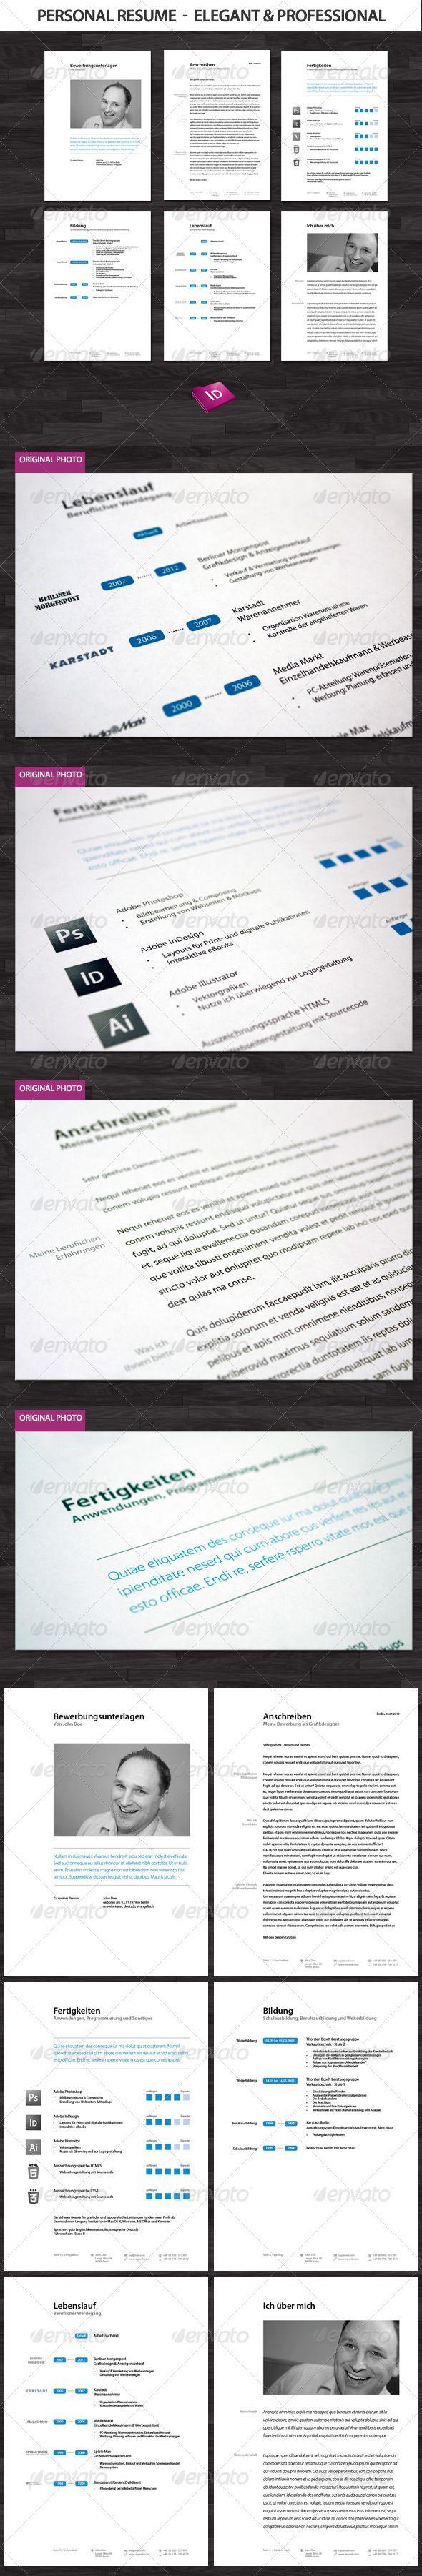 best images about design website porfolio professional and elegant resume set